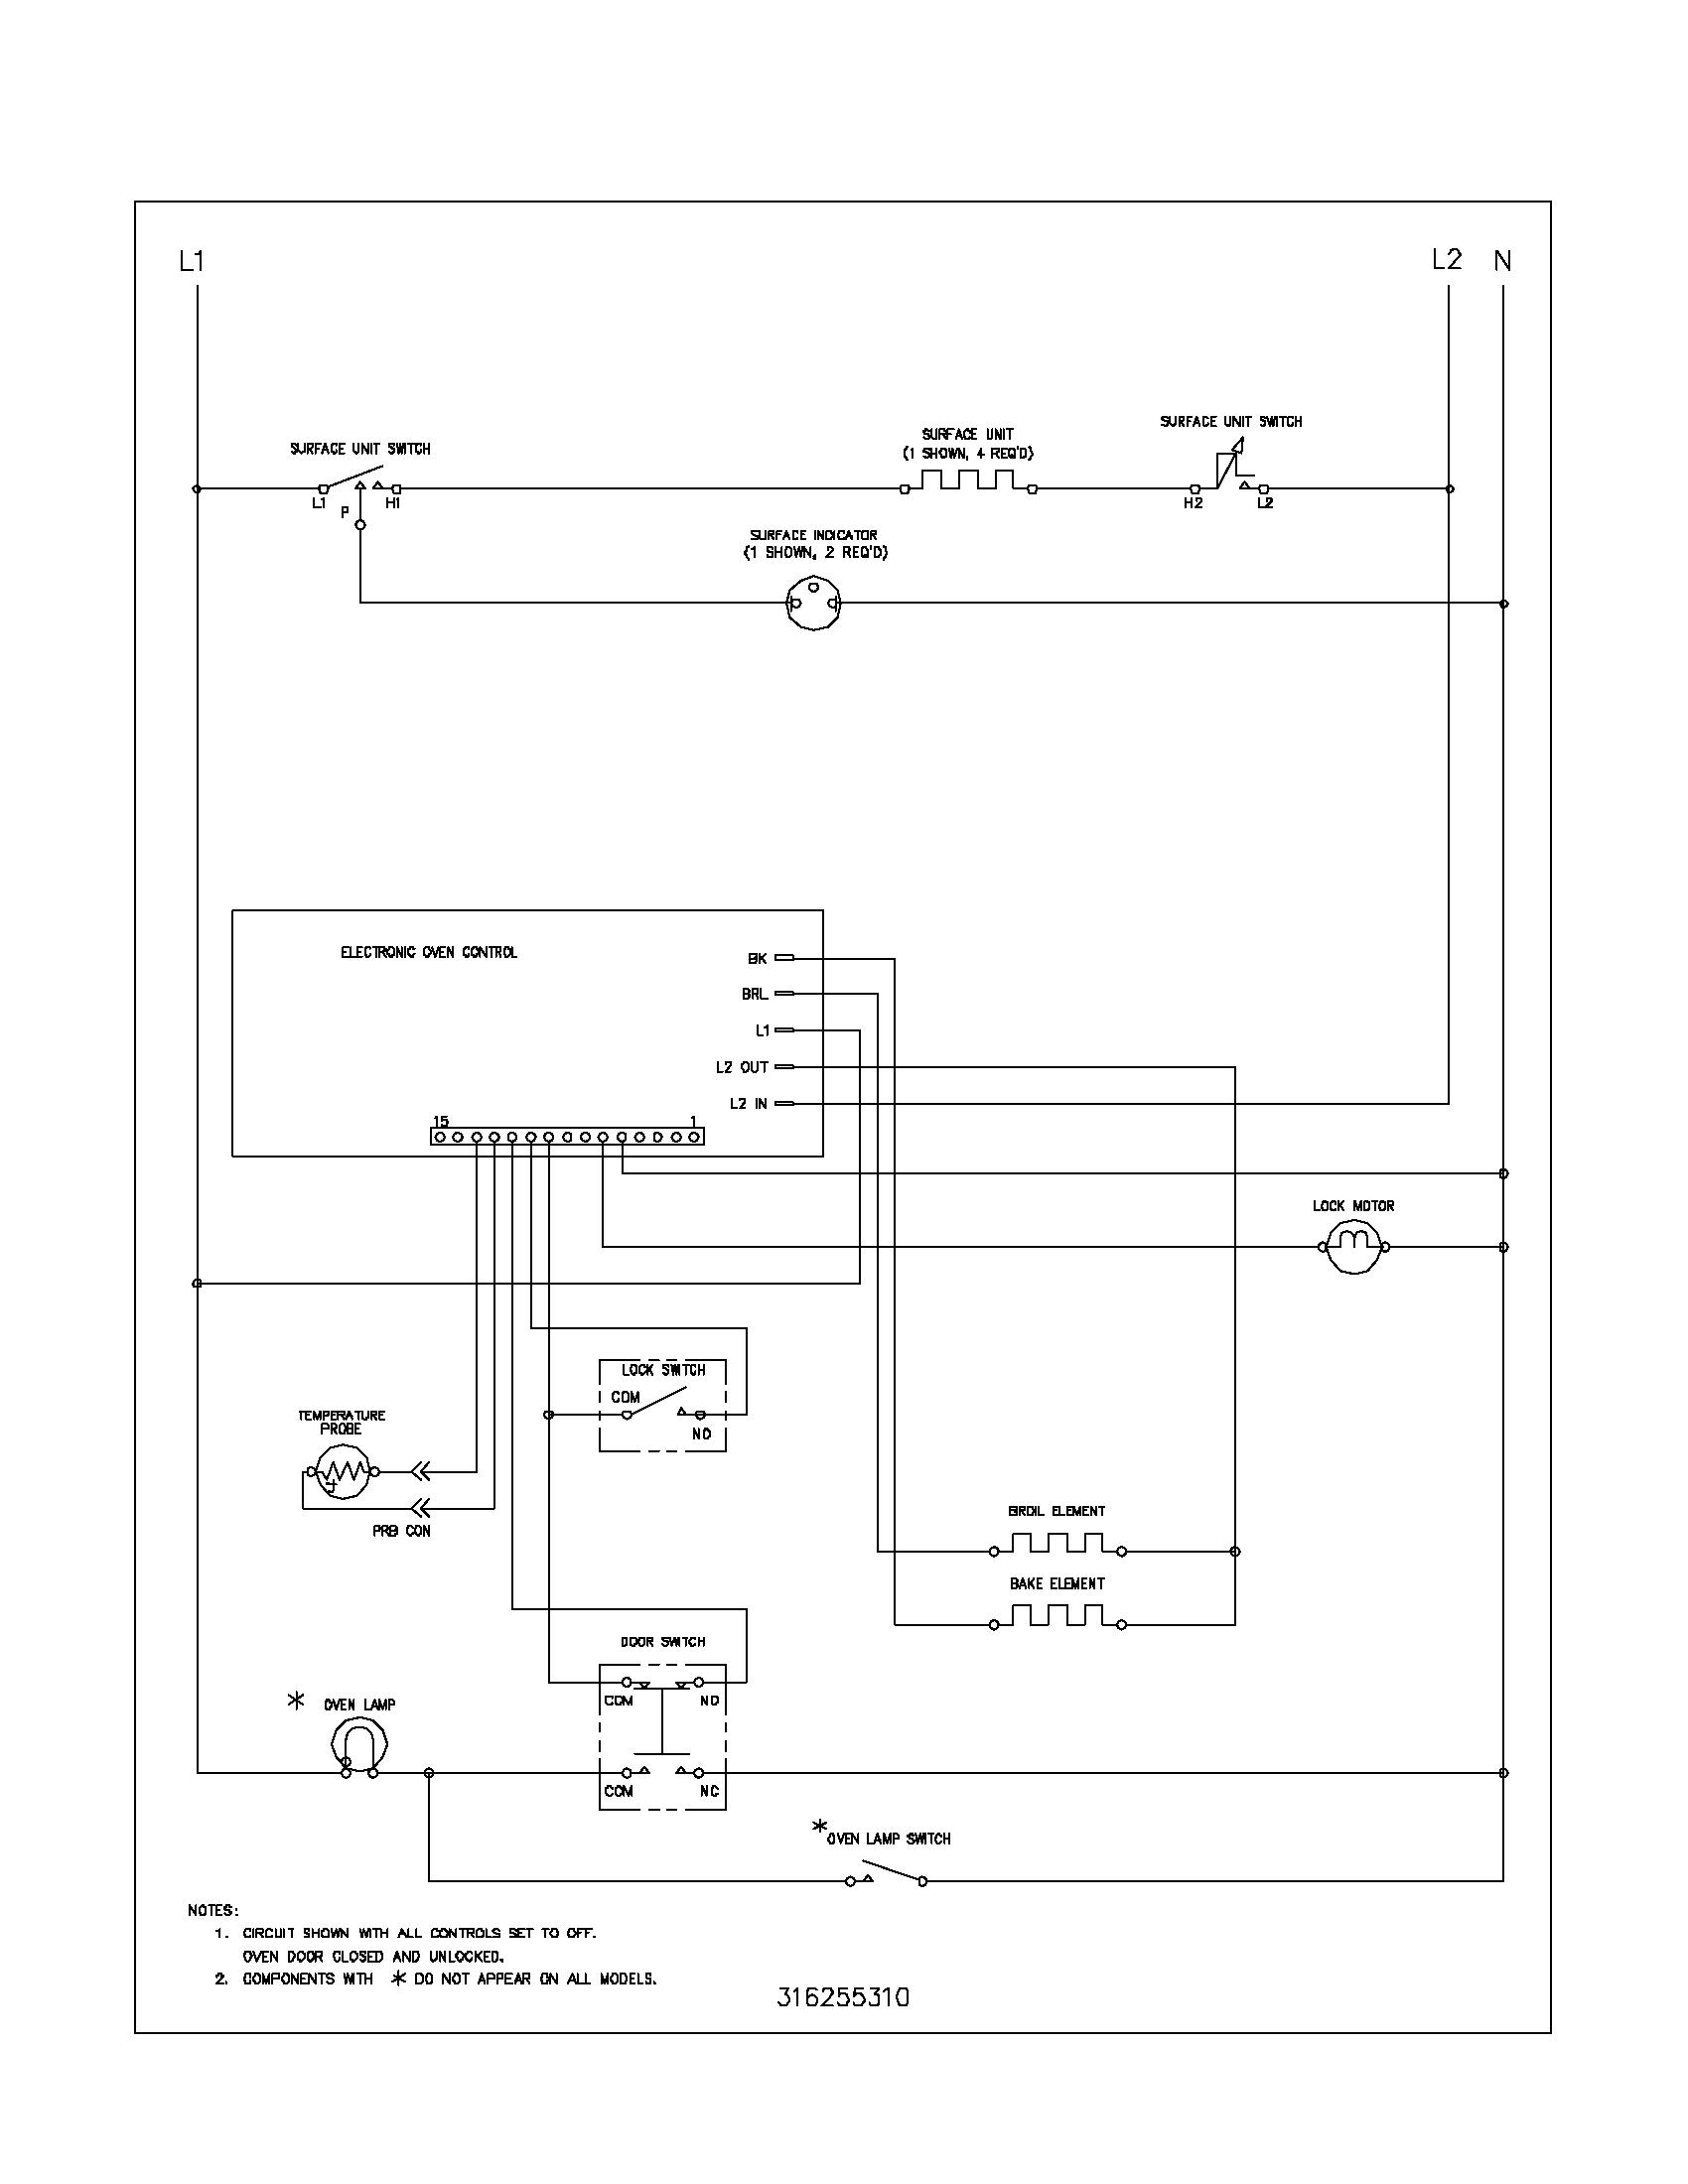 Whirlpool Lgr8648pg0 Wiring Schematic Electrical Work Diagram For Duet Washer Magnificent Kenmore Dryer Festooning Simple Rh Littleforestgirl Net Profile Refrigerator